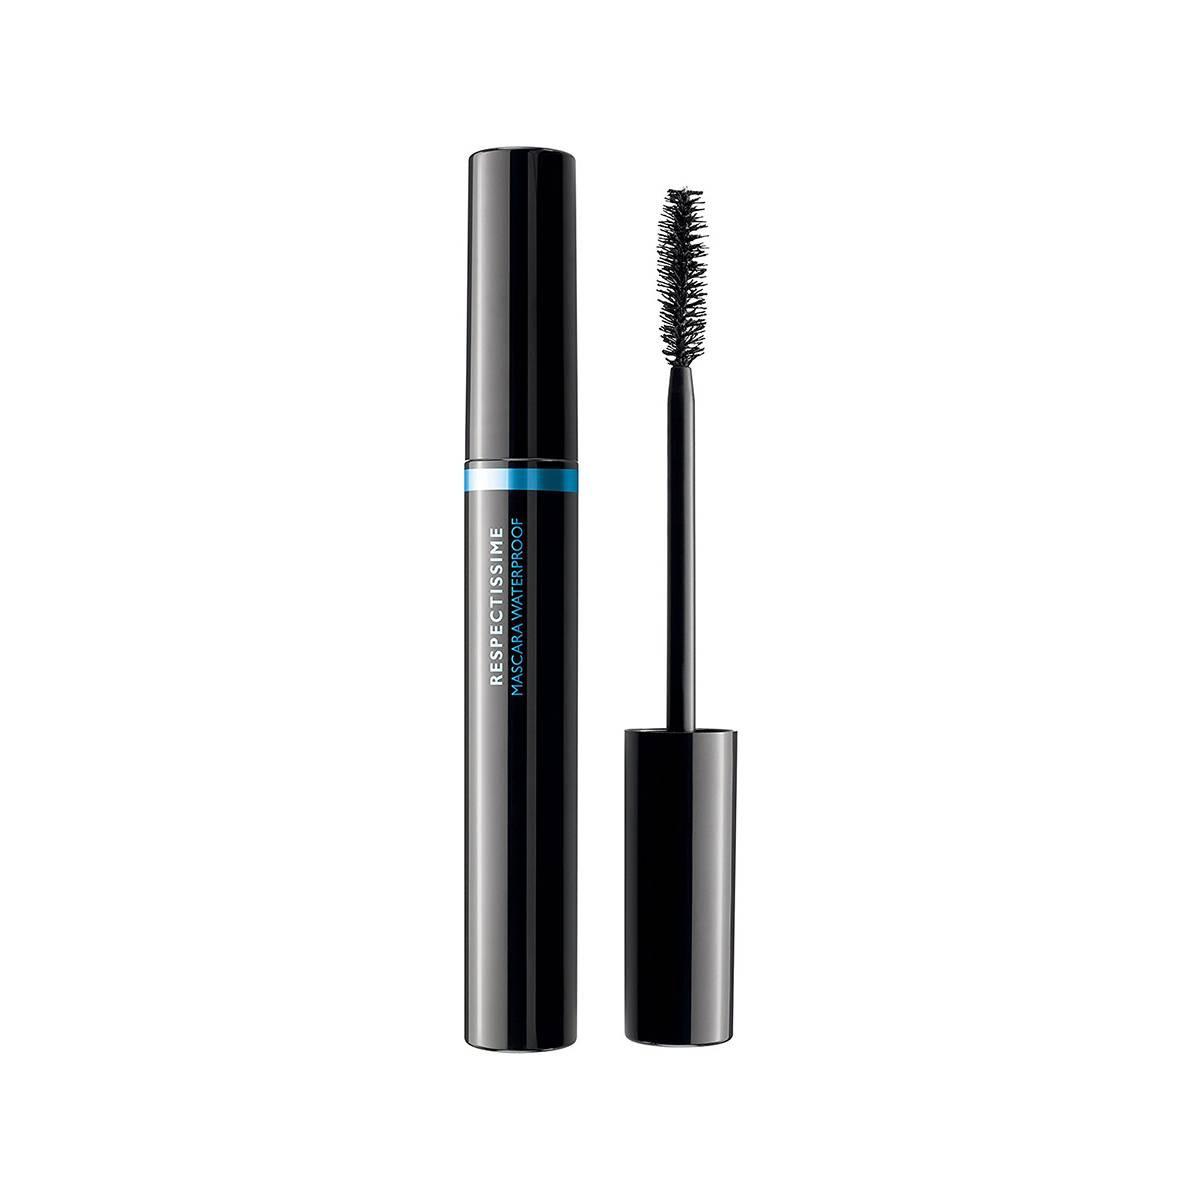 popular-mascara-on-pinterest-255403-1524237515971-main.1200x0c.jpg